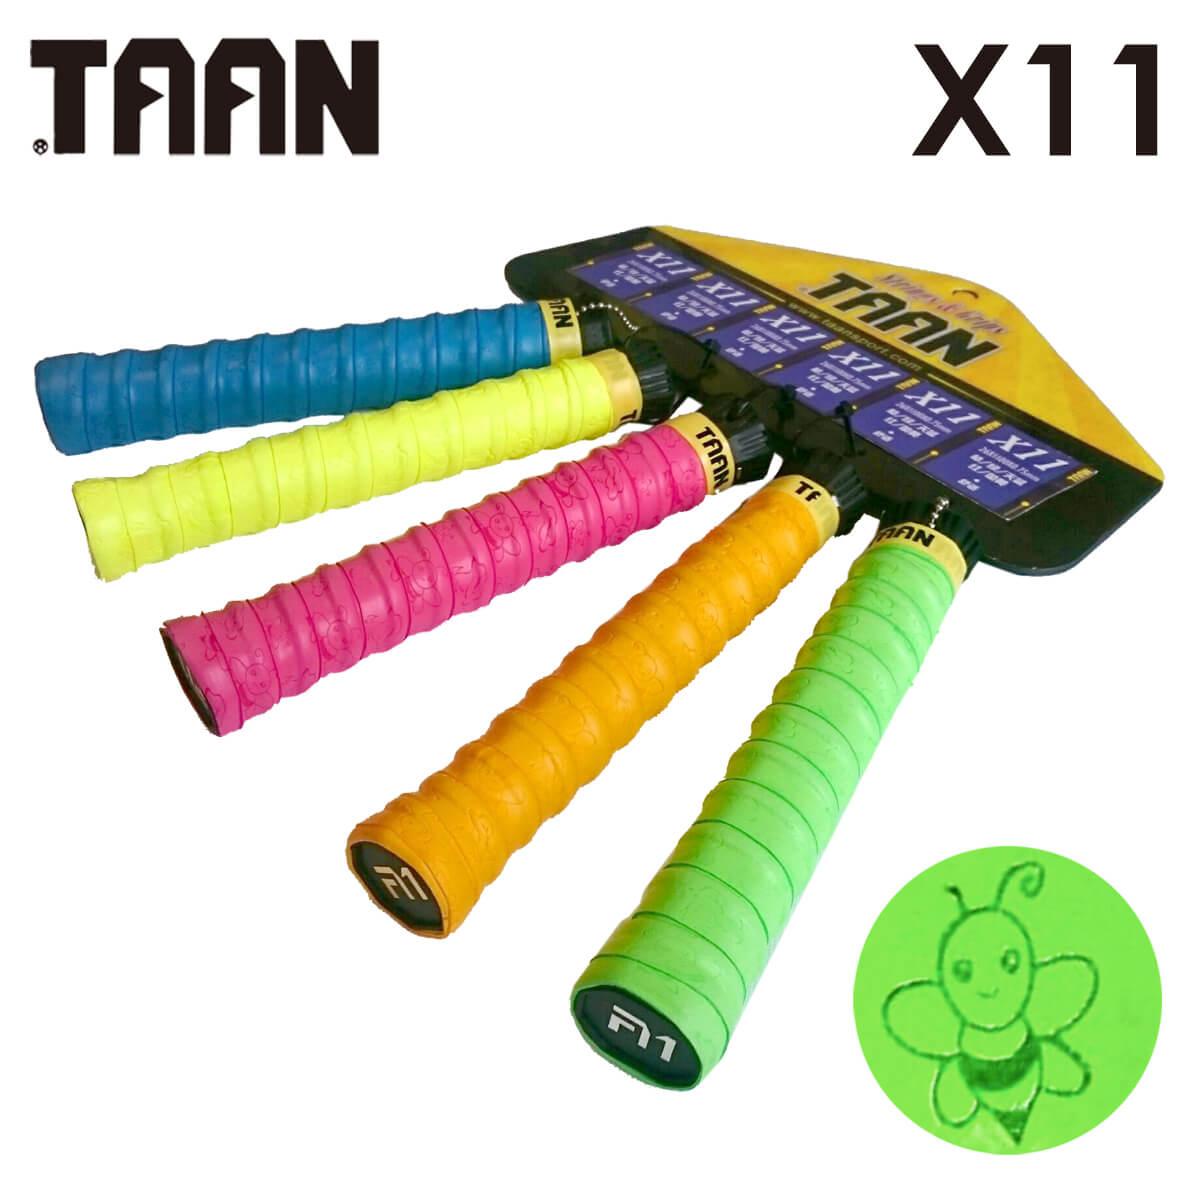 TAAN X11 デコボコウェットグリップ(蜂 はち) グリップテープ バドミントン・テニス タアン TAAN X11 デコボコウェットグリップ(蜂 はち) グリップテープ バドミントン・テニス タアン【メール便可】